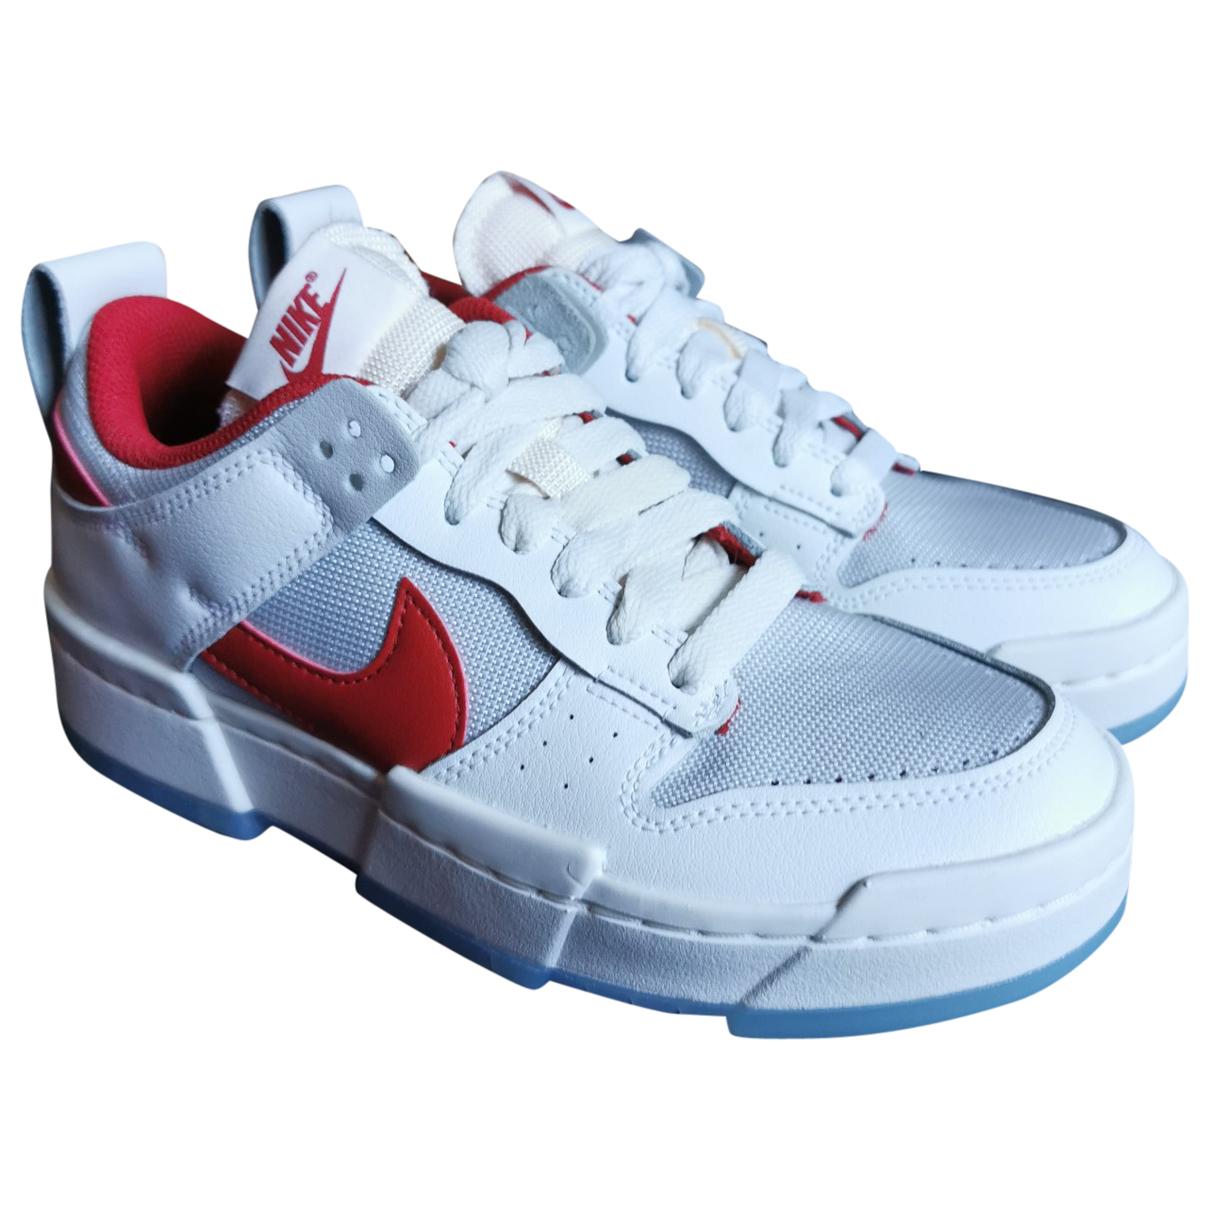 Nike SB Dunk  White Leather Trainers for Women 37.5 EU